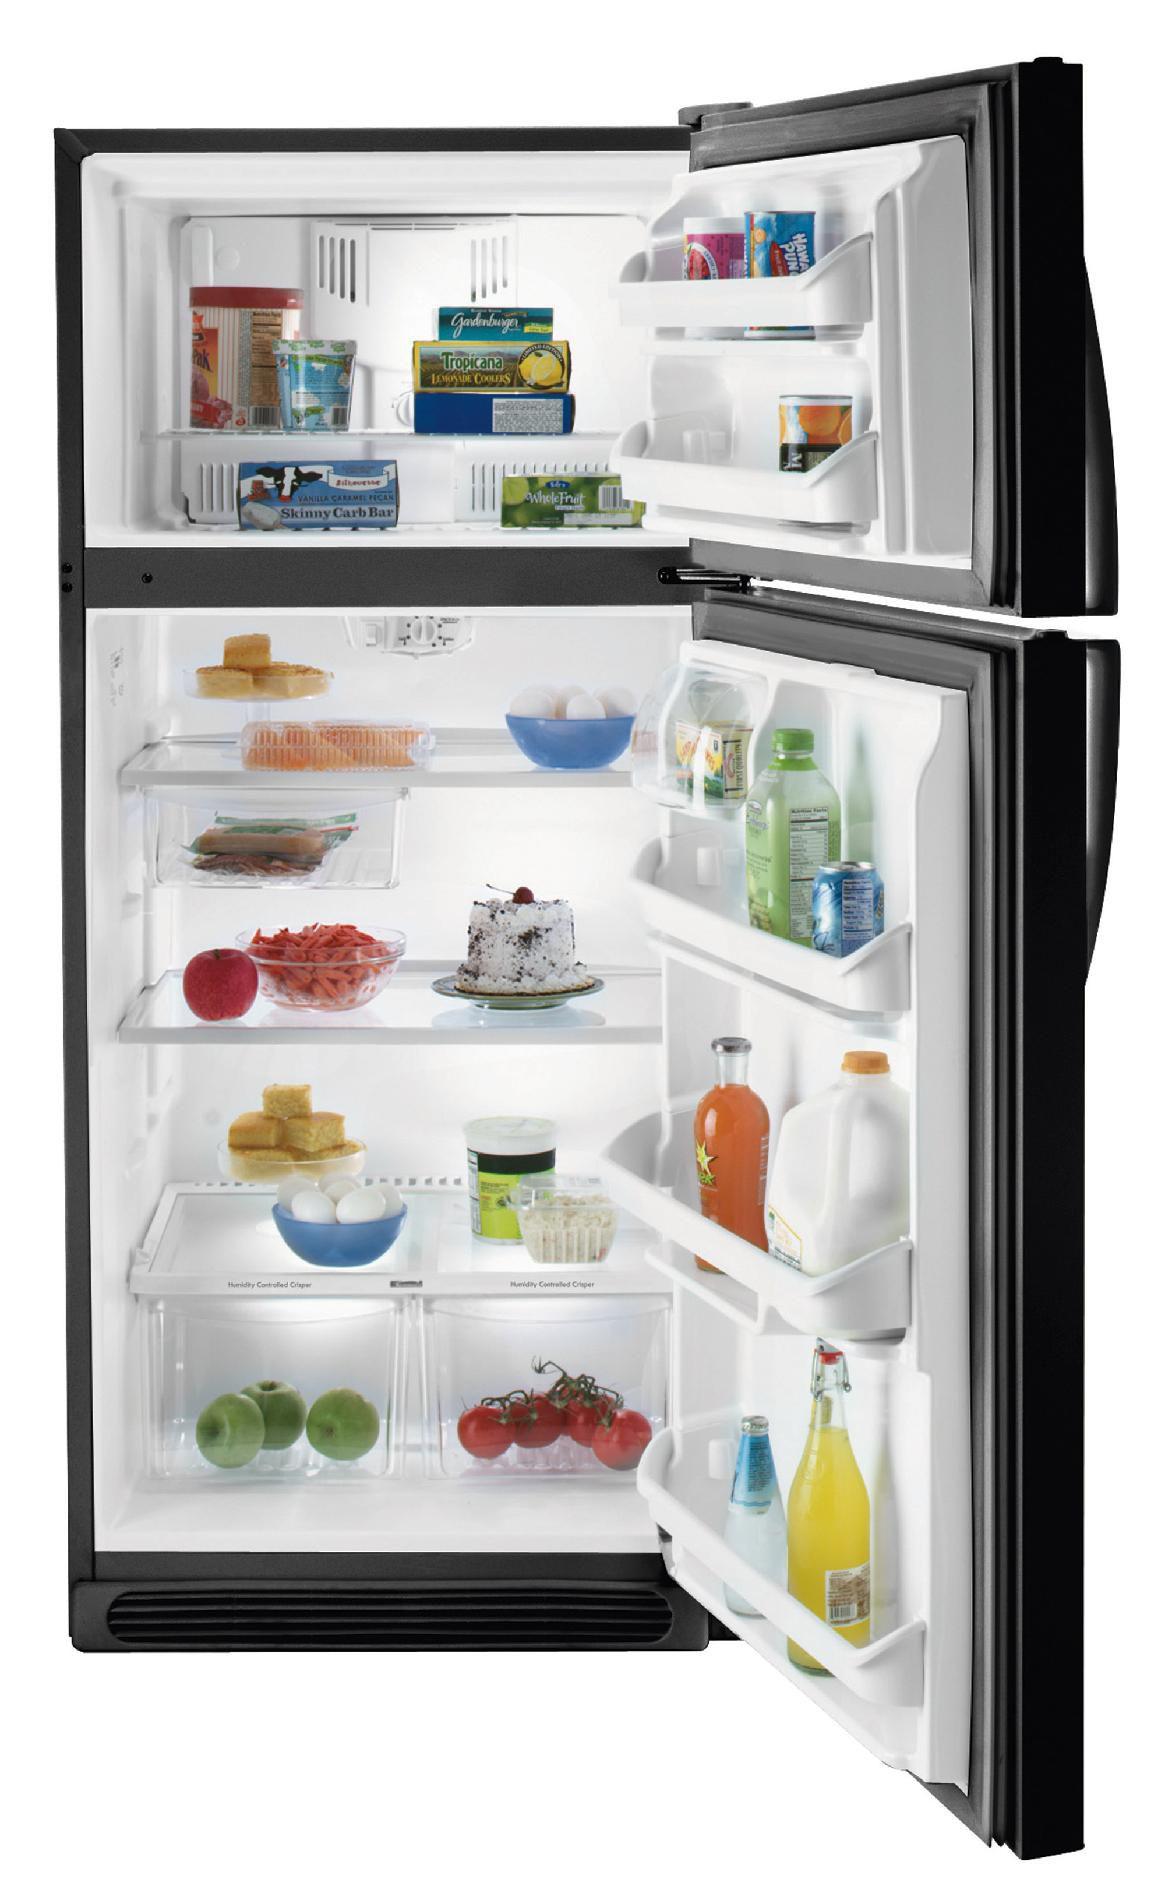 Kenmore 20.5 cu. ft. Top Freezer Refrigerator